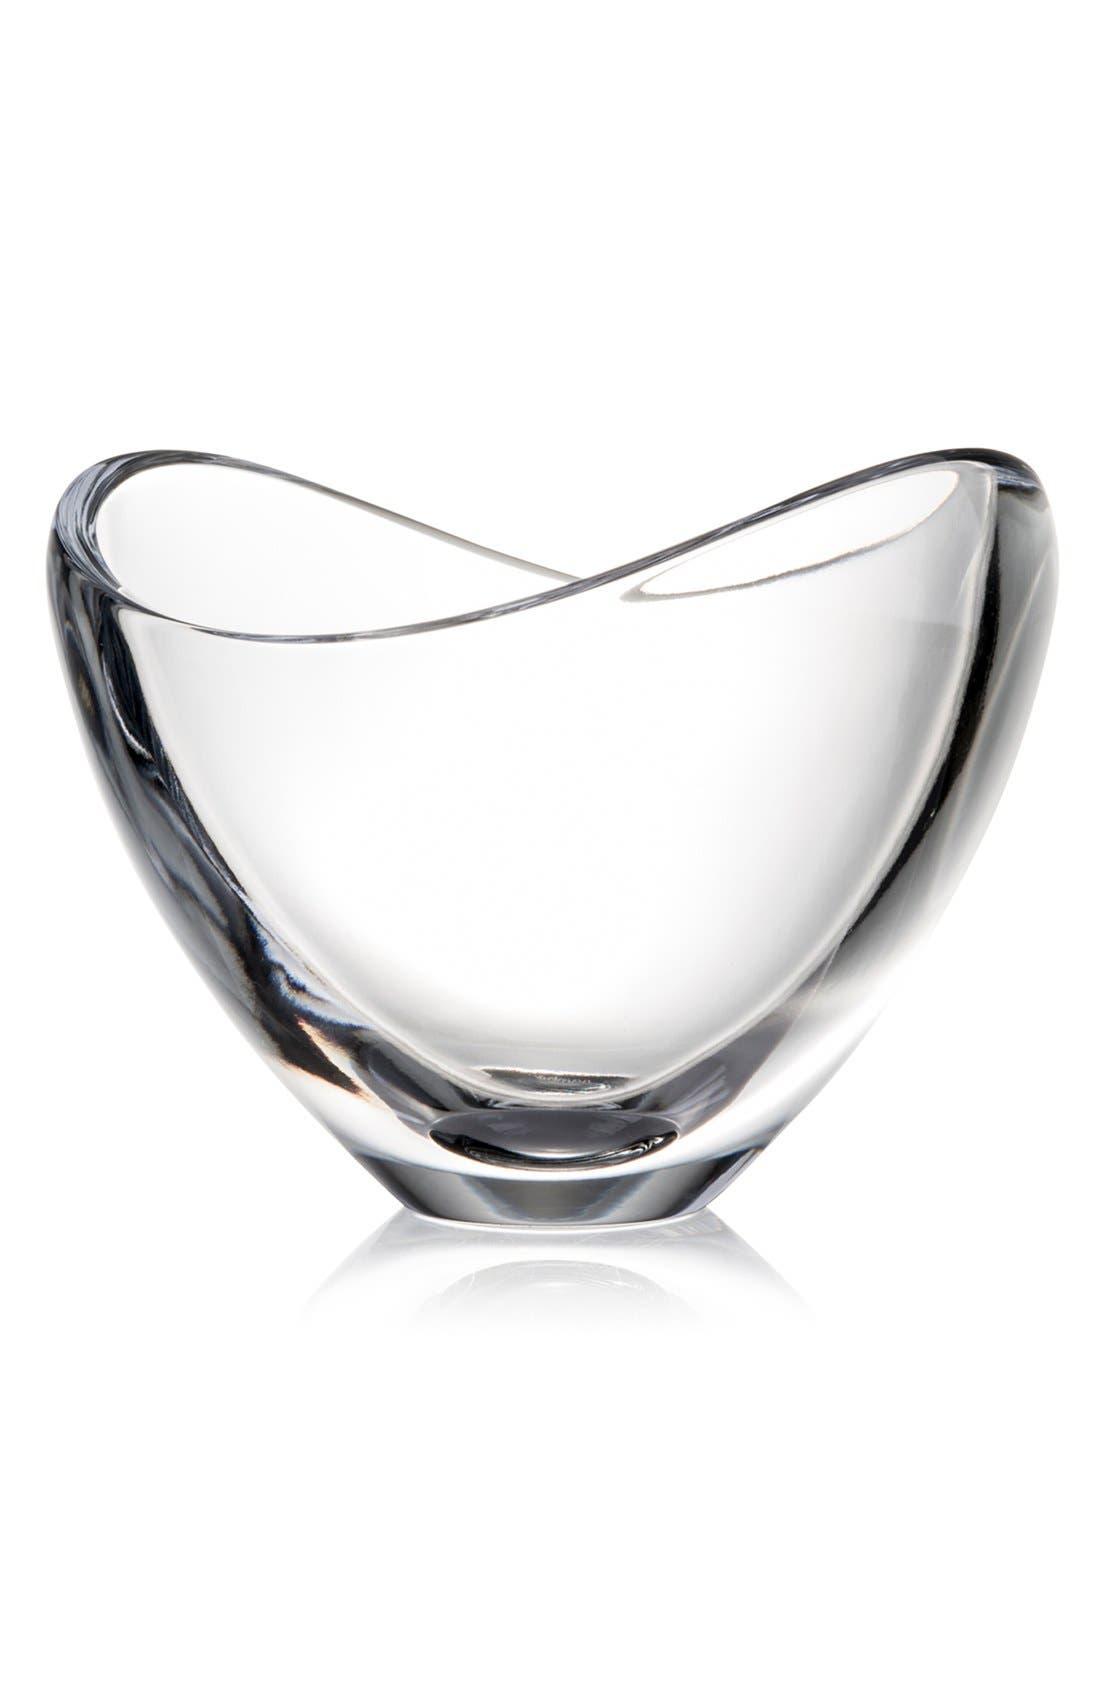 Alternate Image 1 Selected - Nambé 'Butterfly' Full-Lead Crystal Bowl